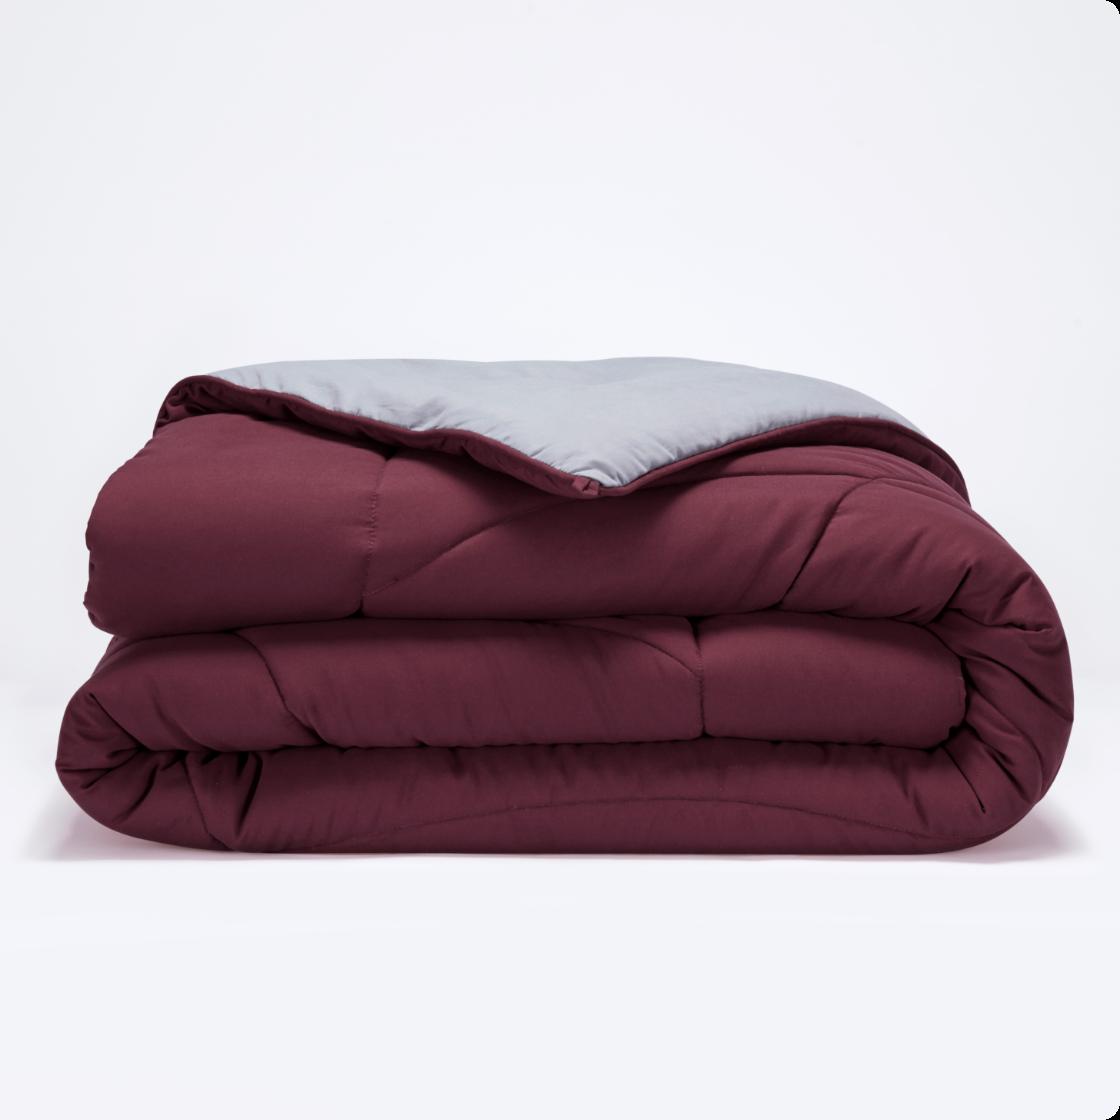 sleep zone bedding reversible comforter red grey gray body temperature regulation